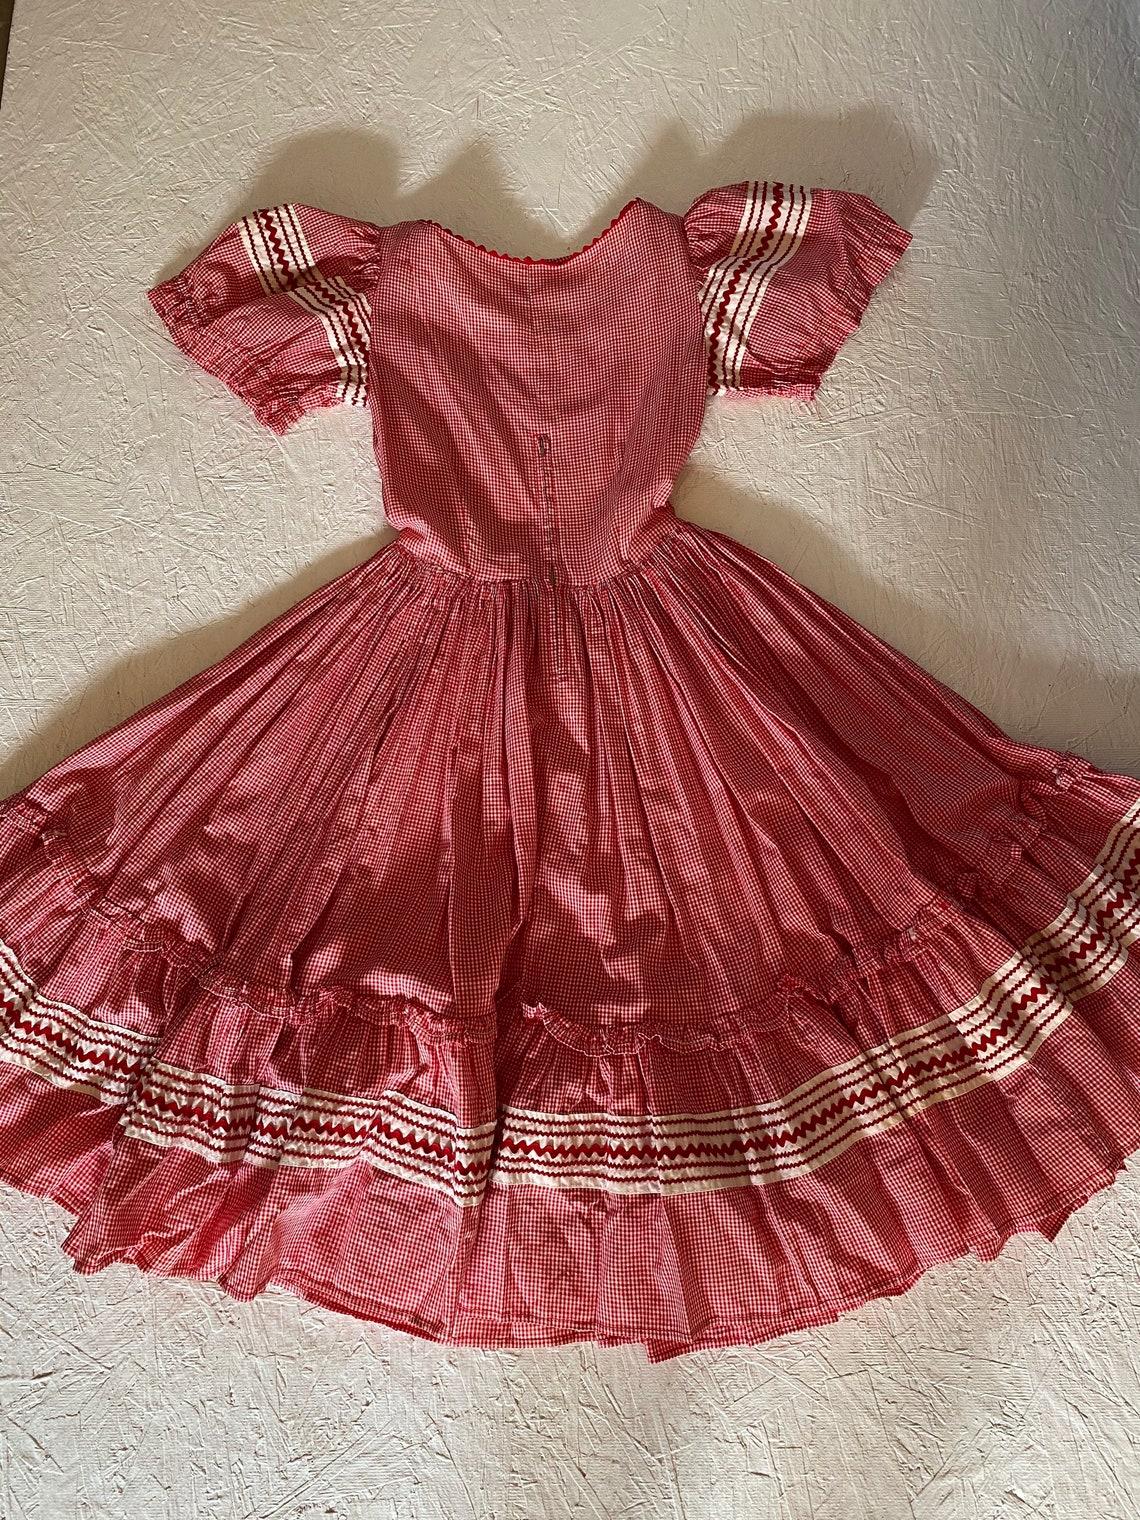 Vintage 50s 60s Square Dance Dress Red Gingham Full Circle